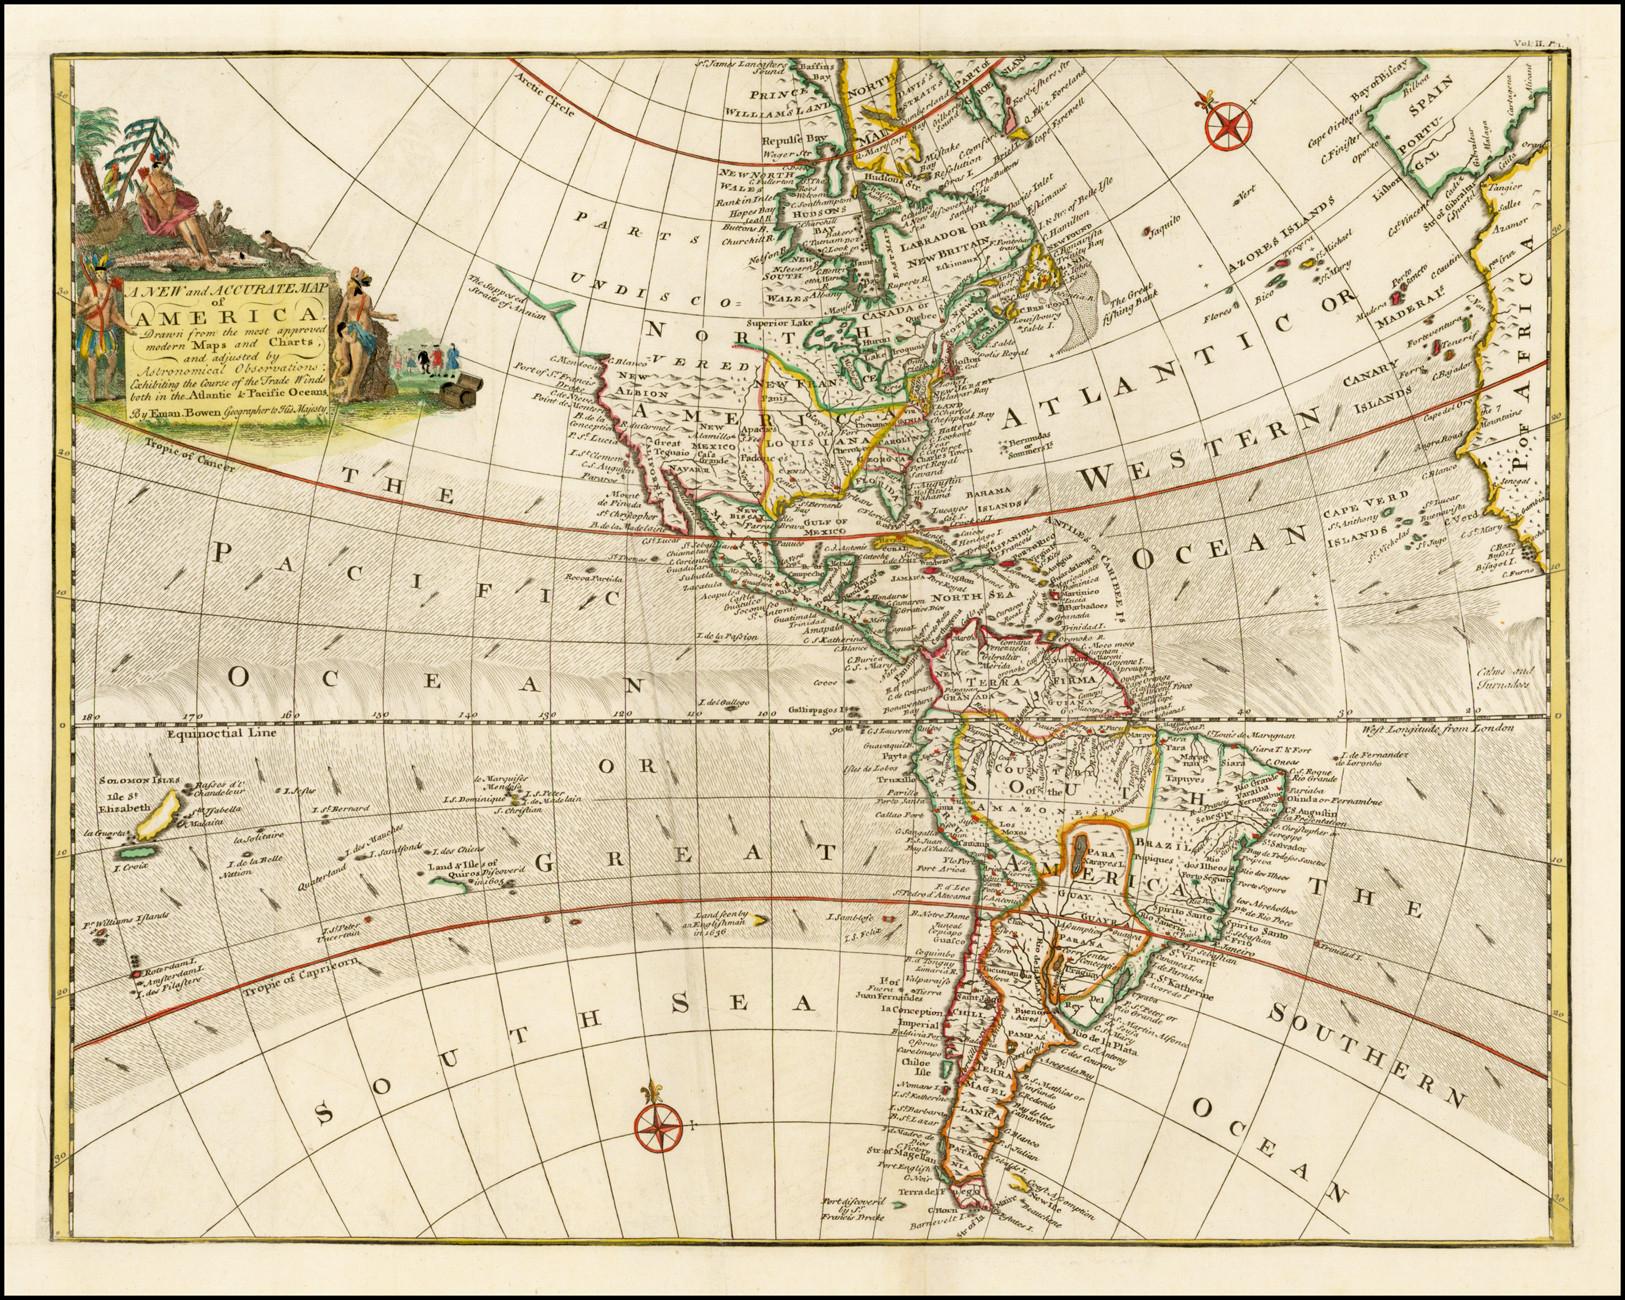 Where Is La Jolla California On A Map Fresh A New And Accurate Map - La Jolla California Map